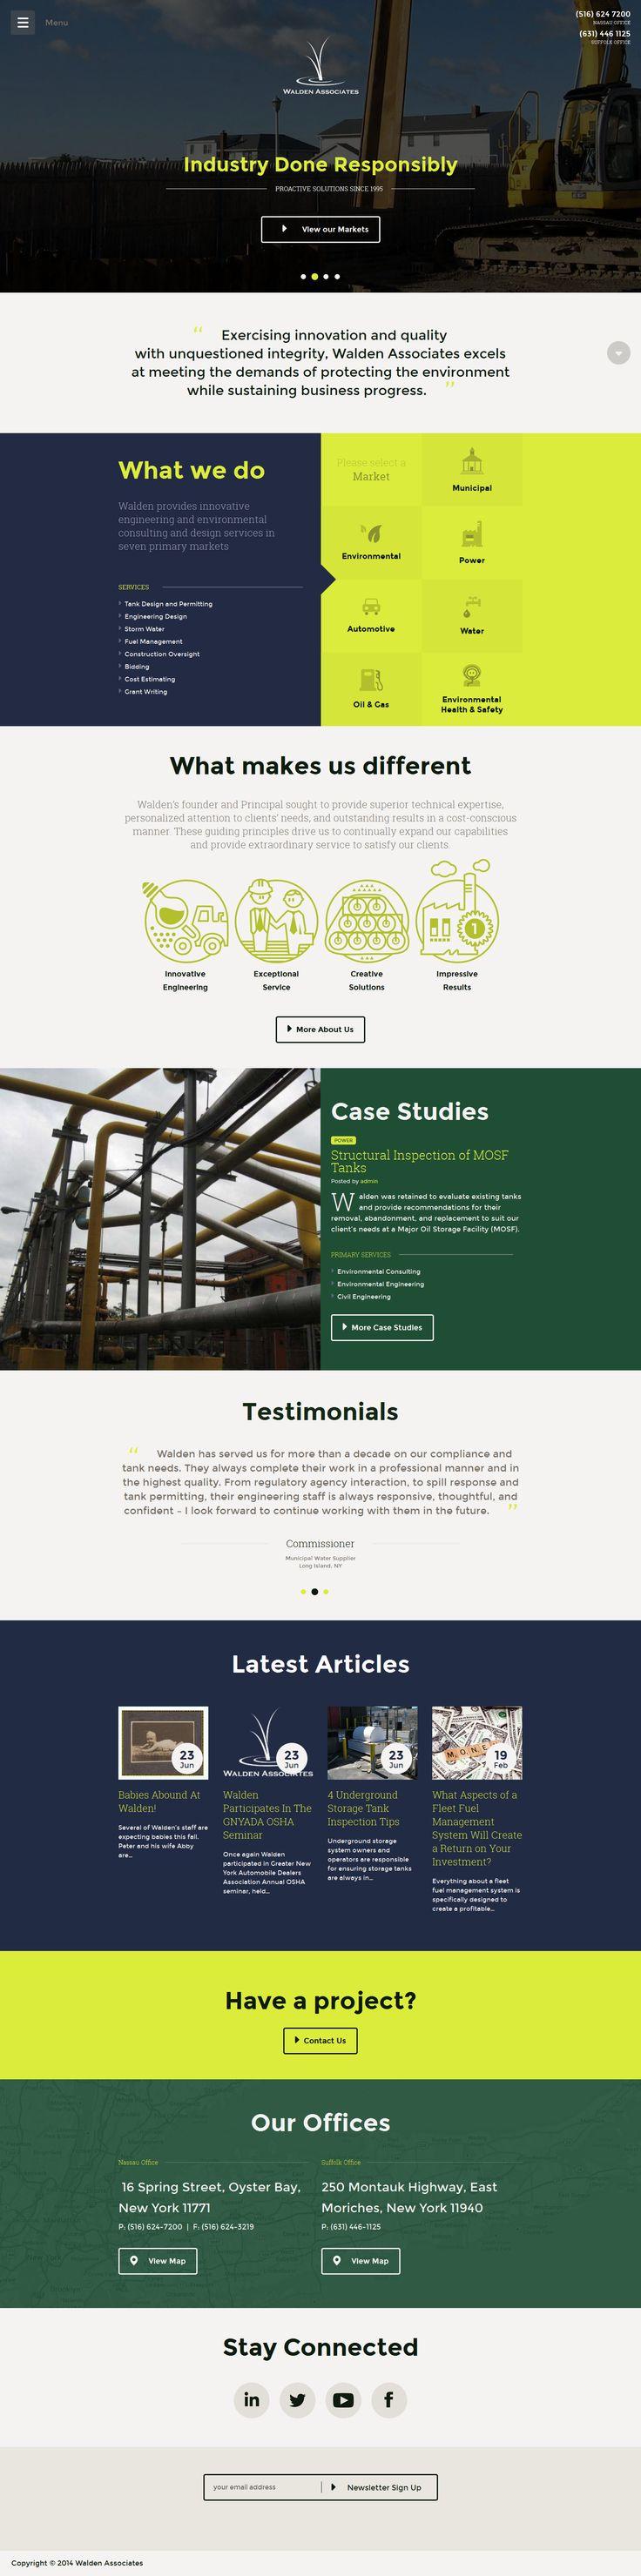 Walden Associates website design and illustration work by www.IsadoraDesign.com